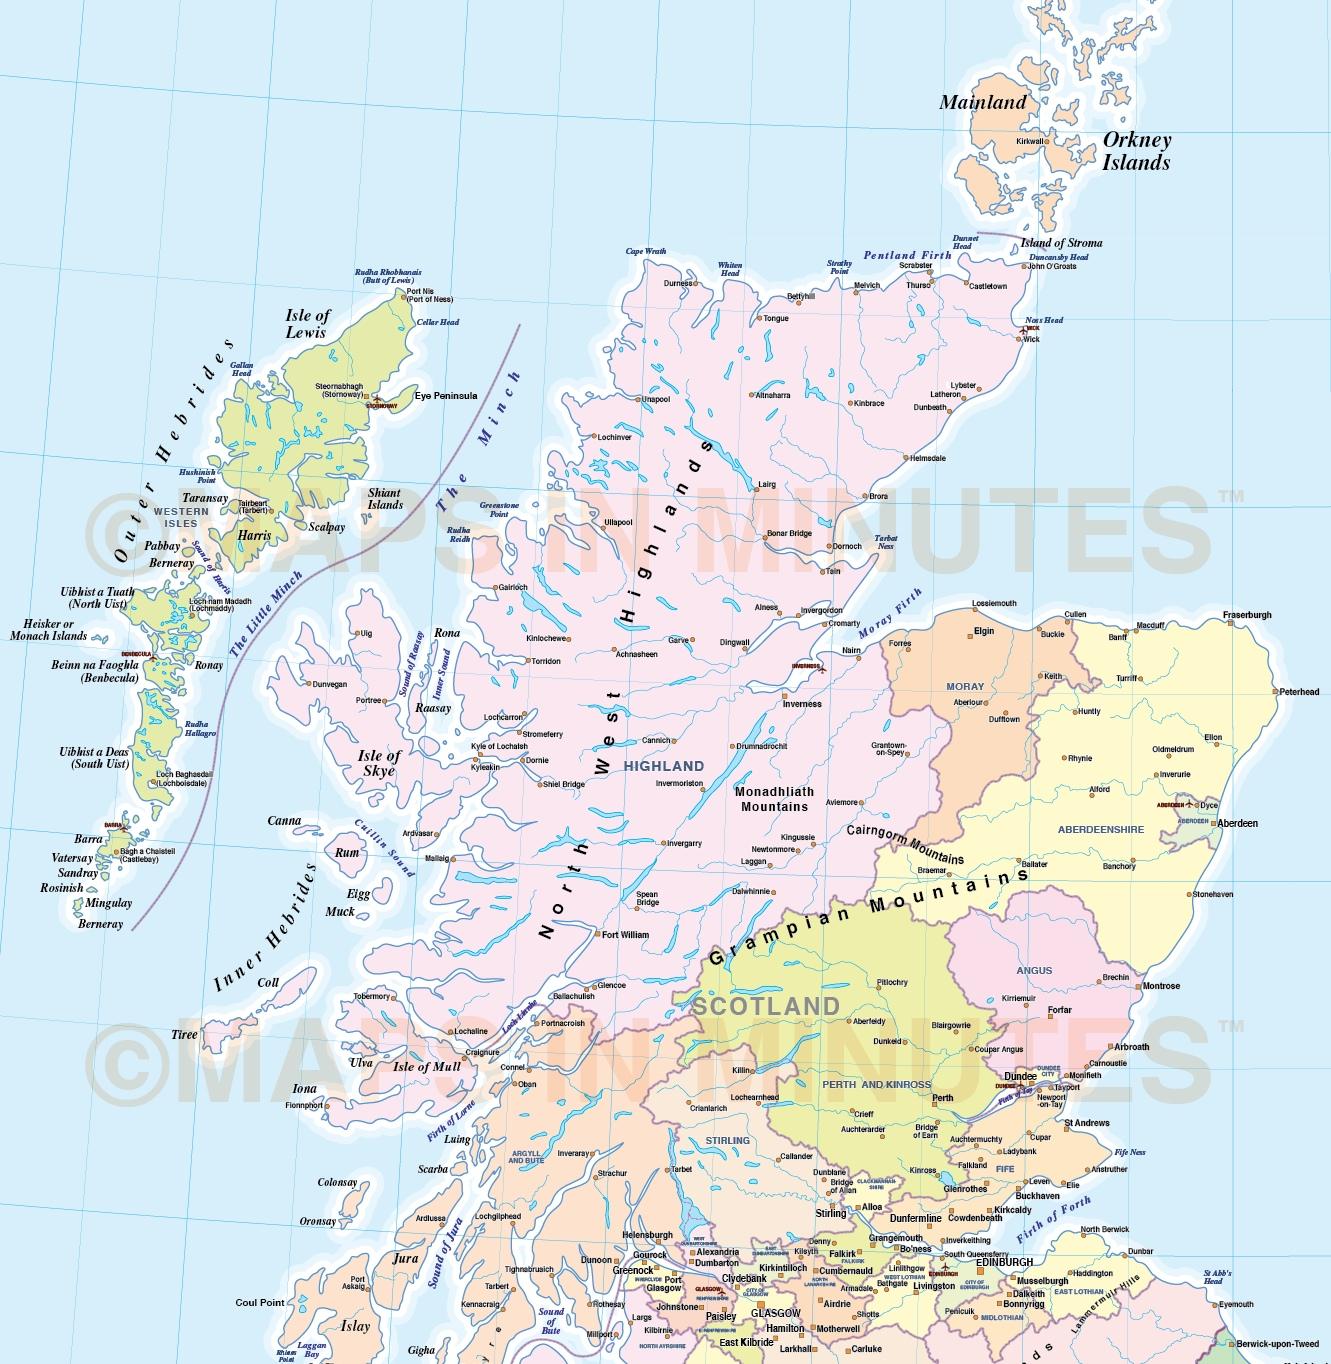 Footiemapcom - Scotland Detailed Street Map Adm British İsles